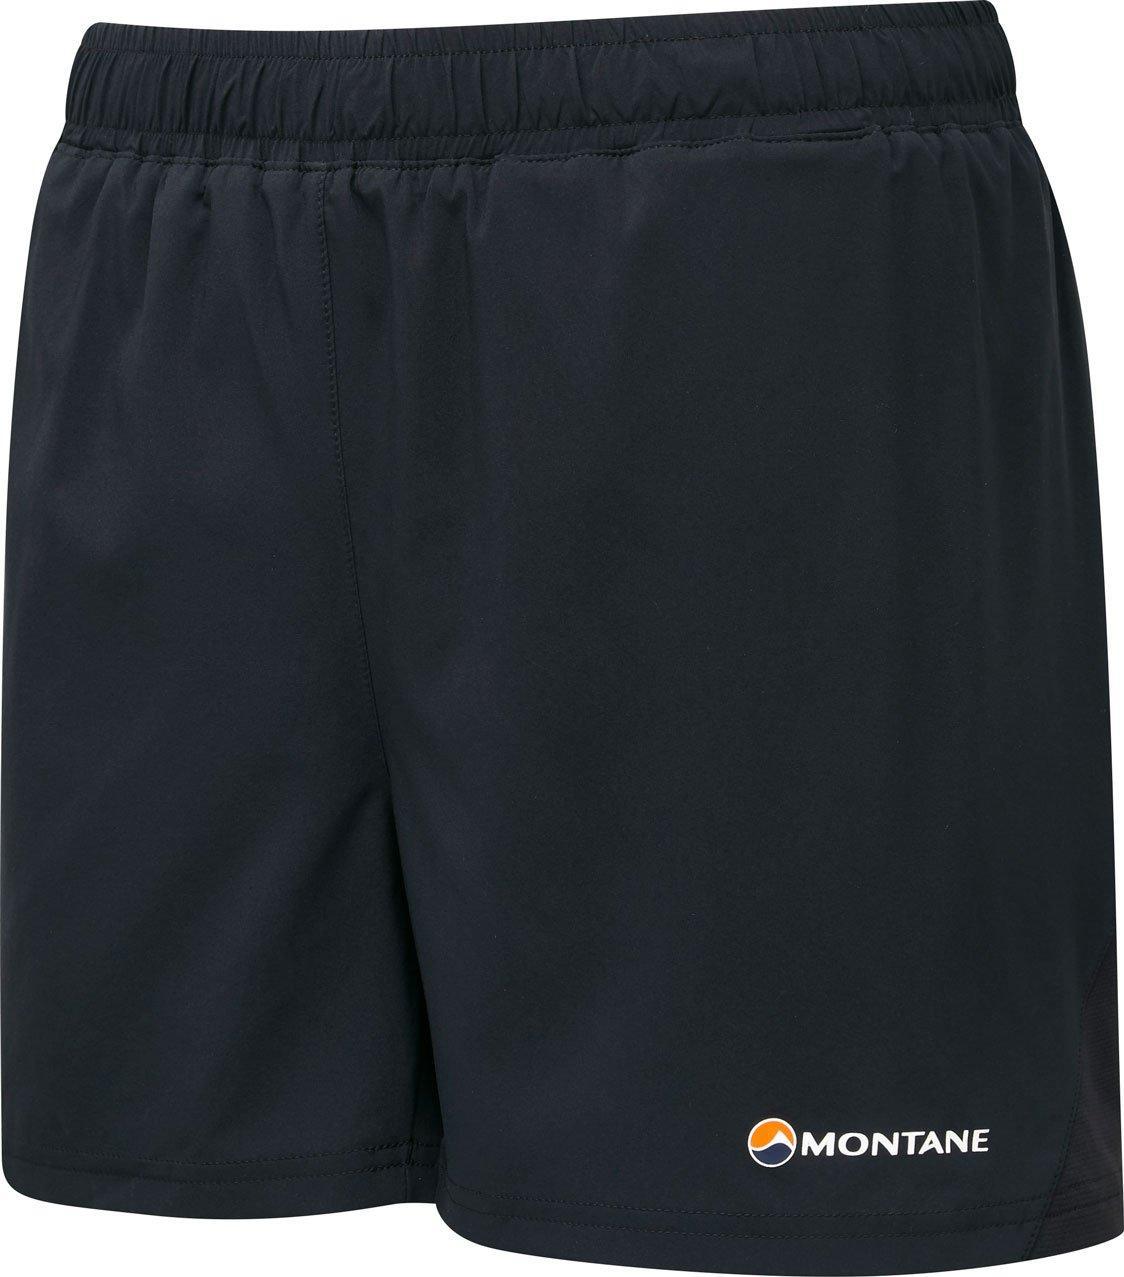 Montane Women's Claw Shorts, BLACK/BLK